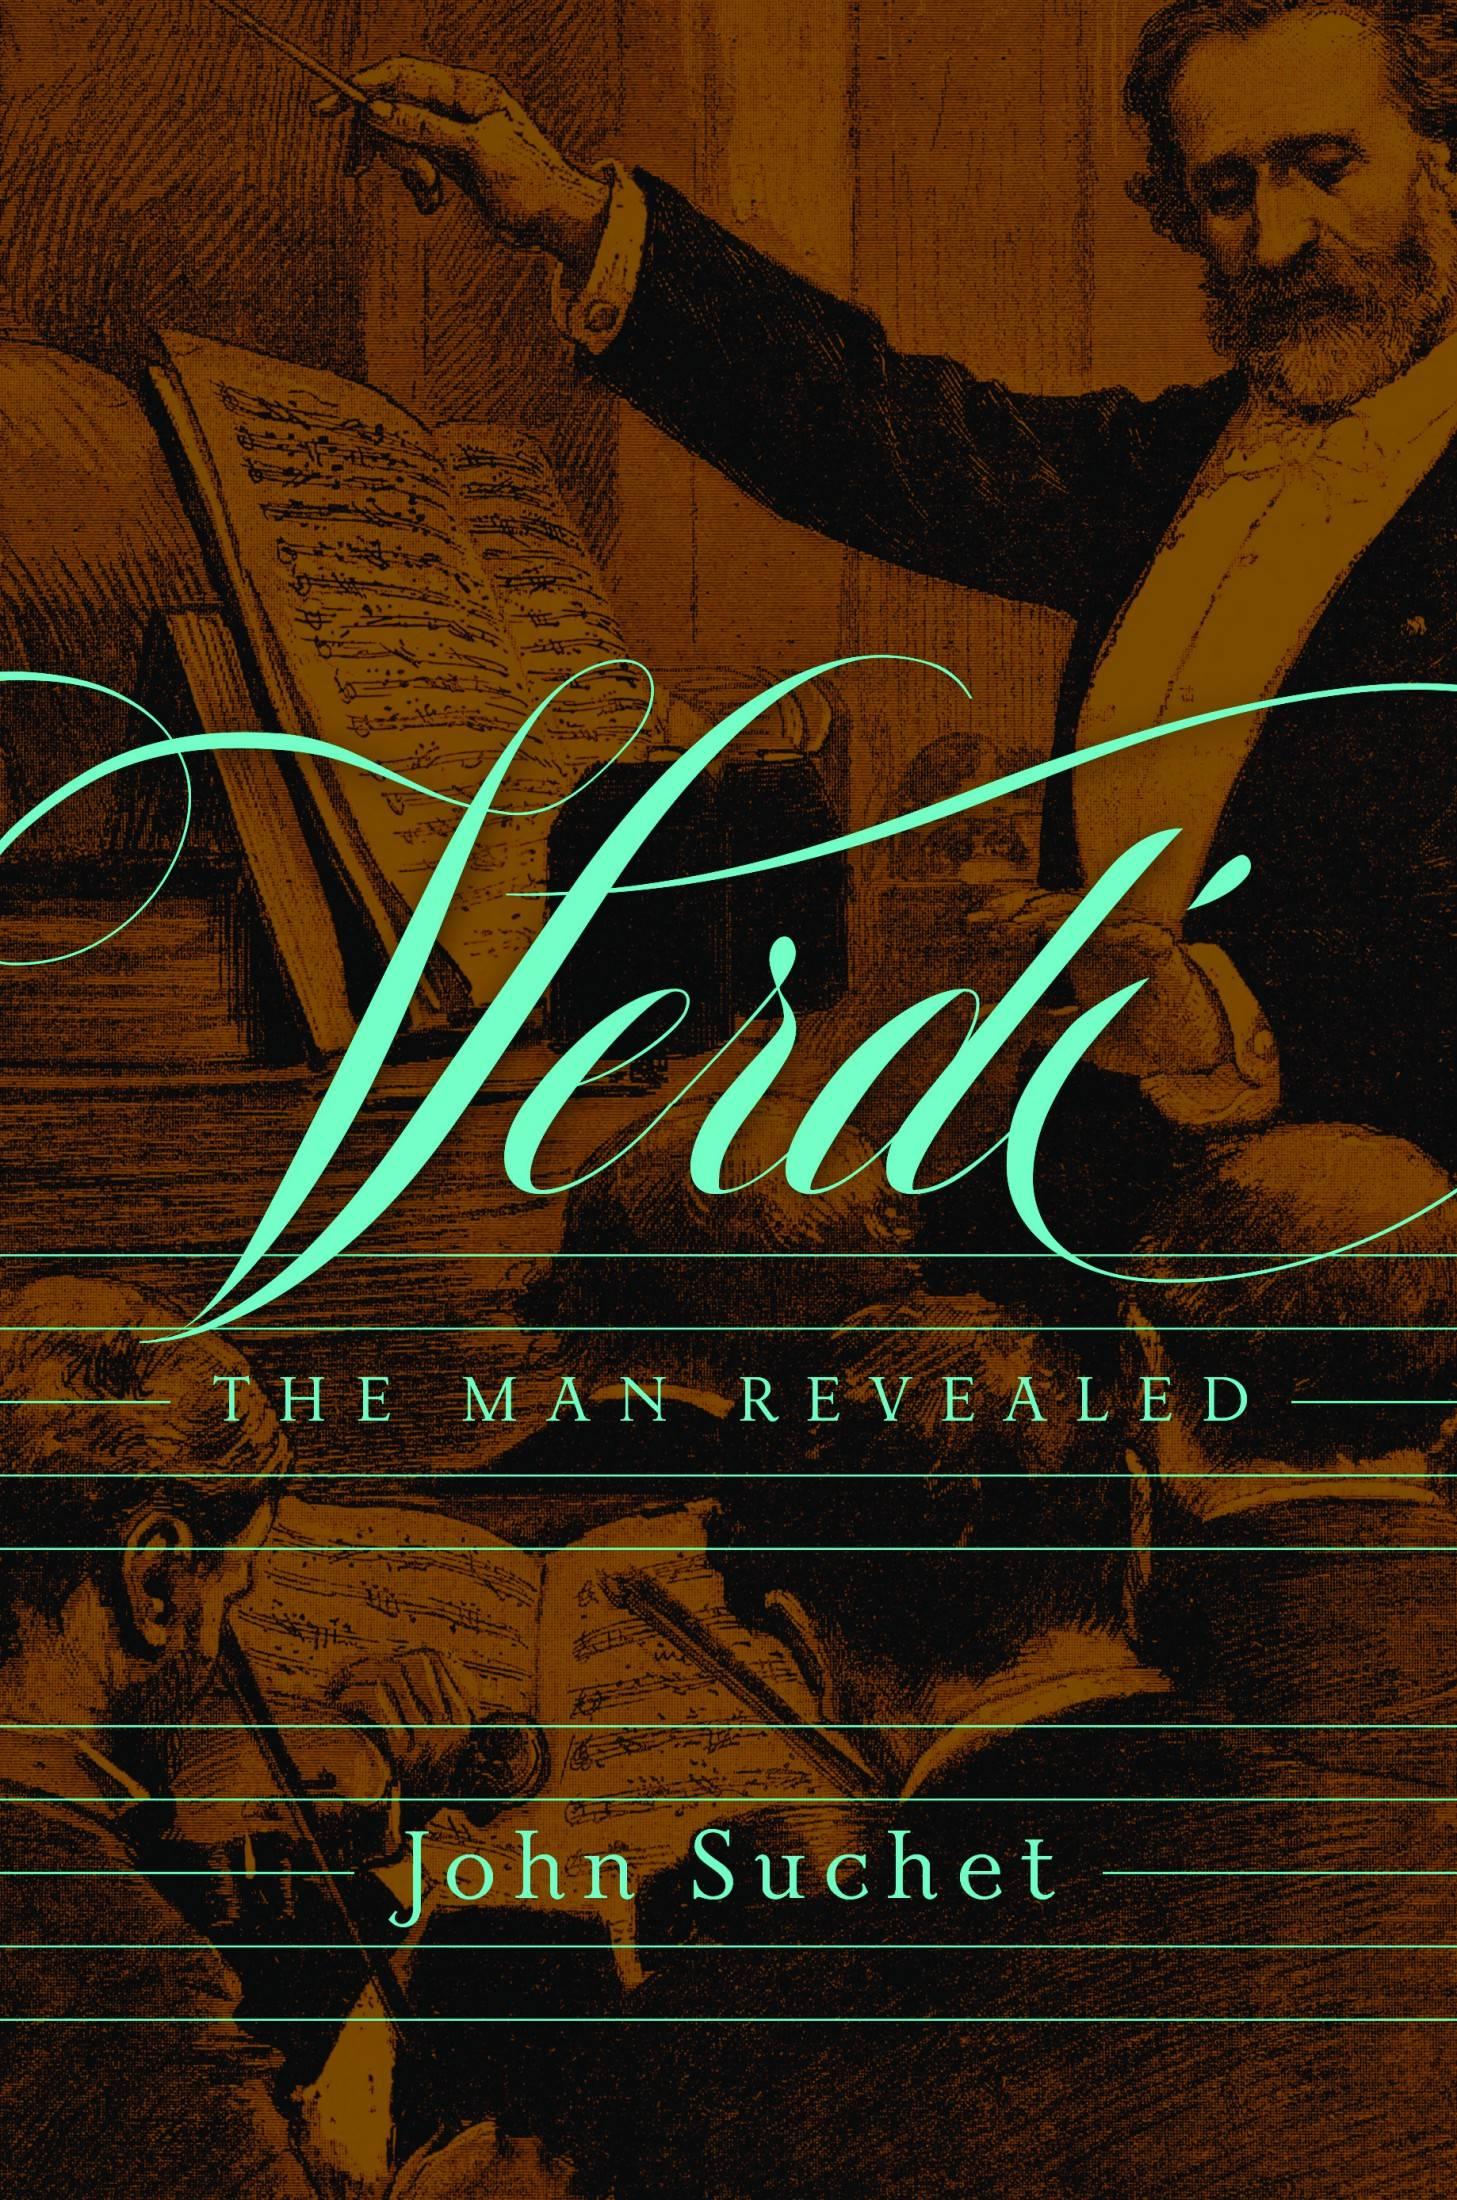 Verdi: The Man Revealed